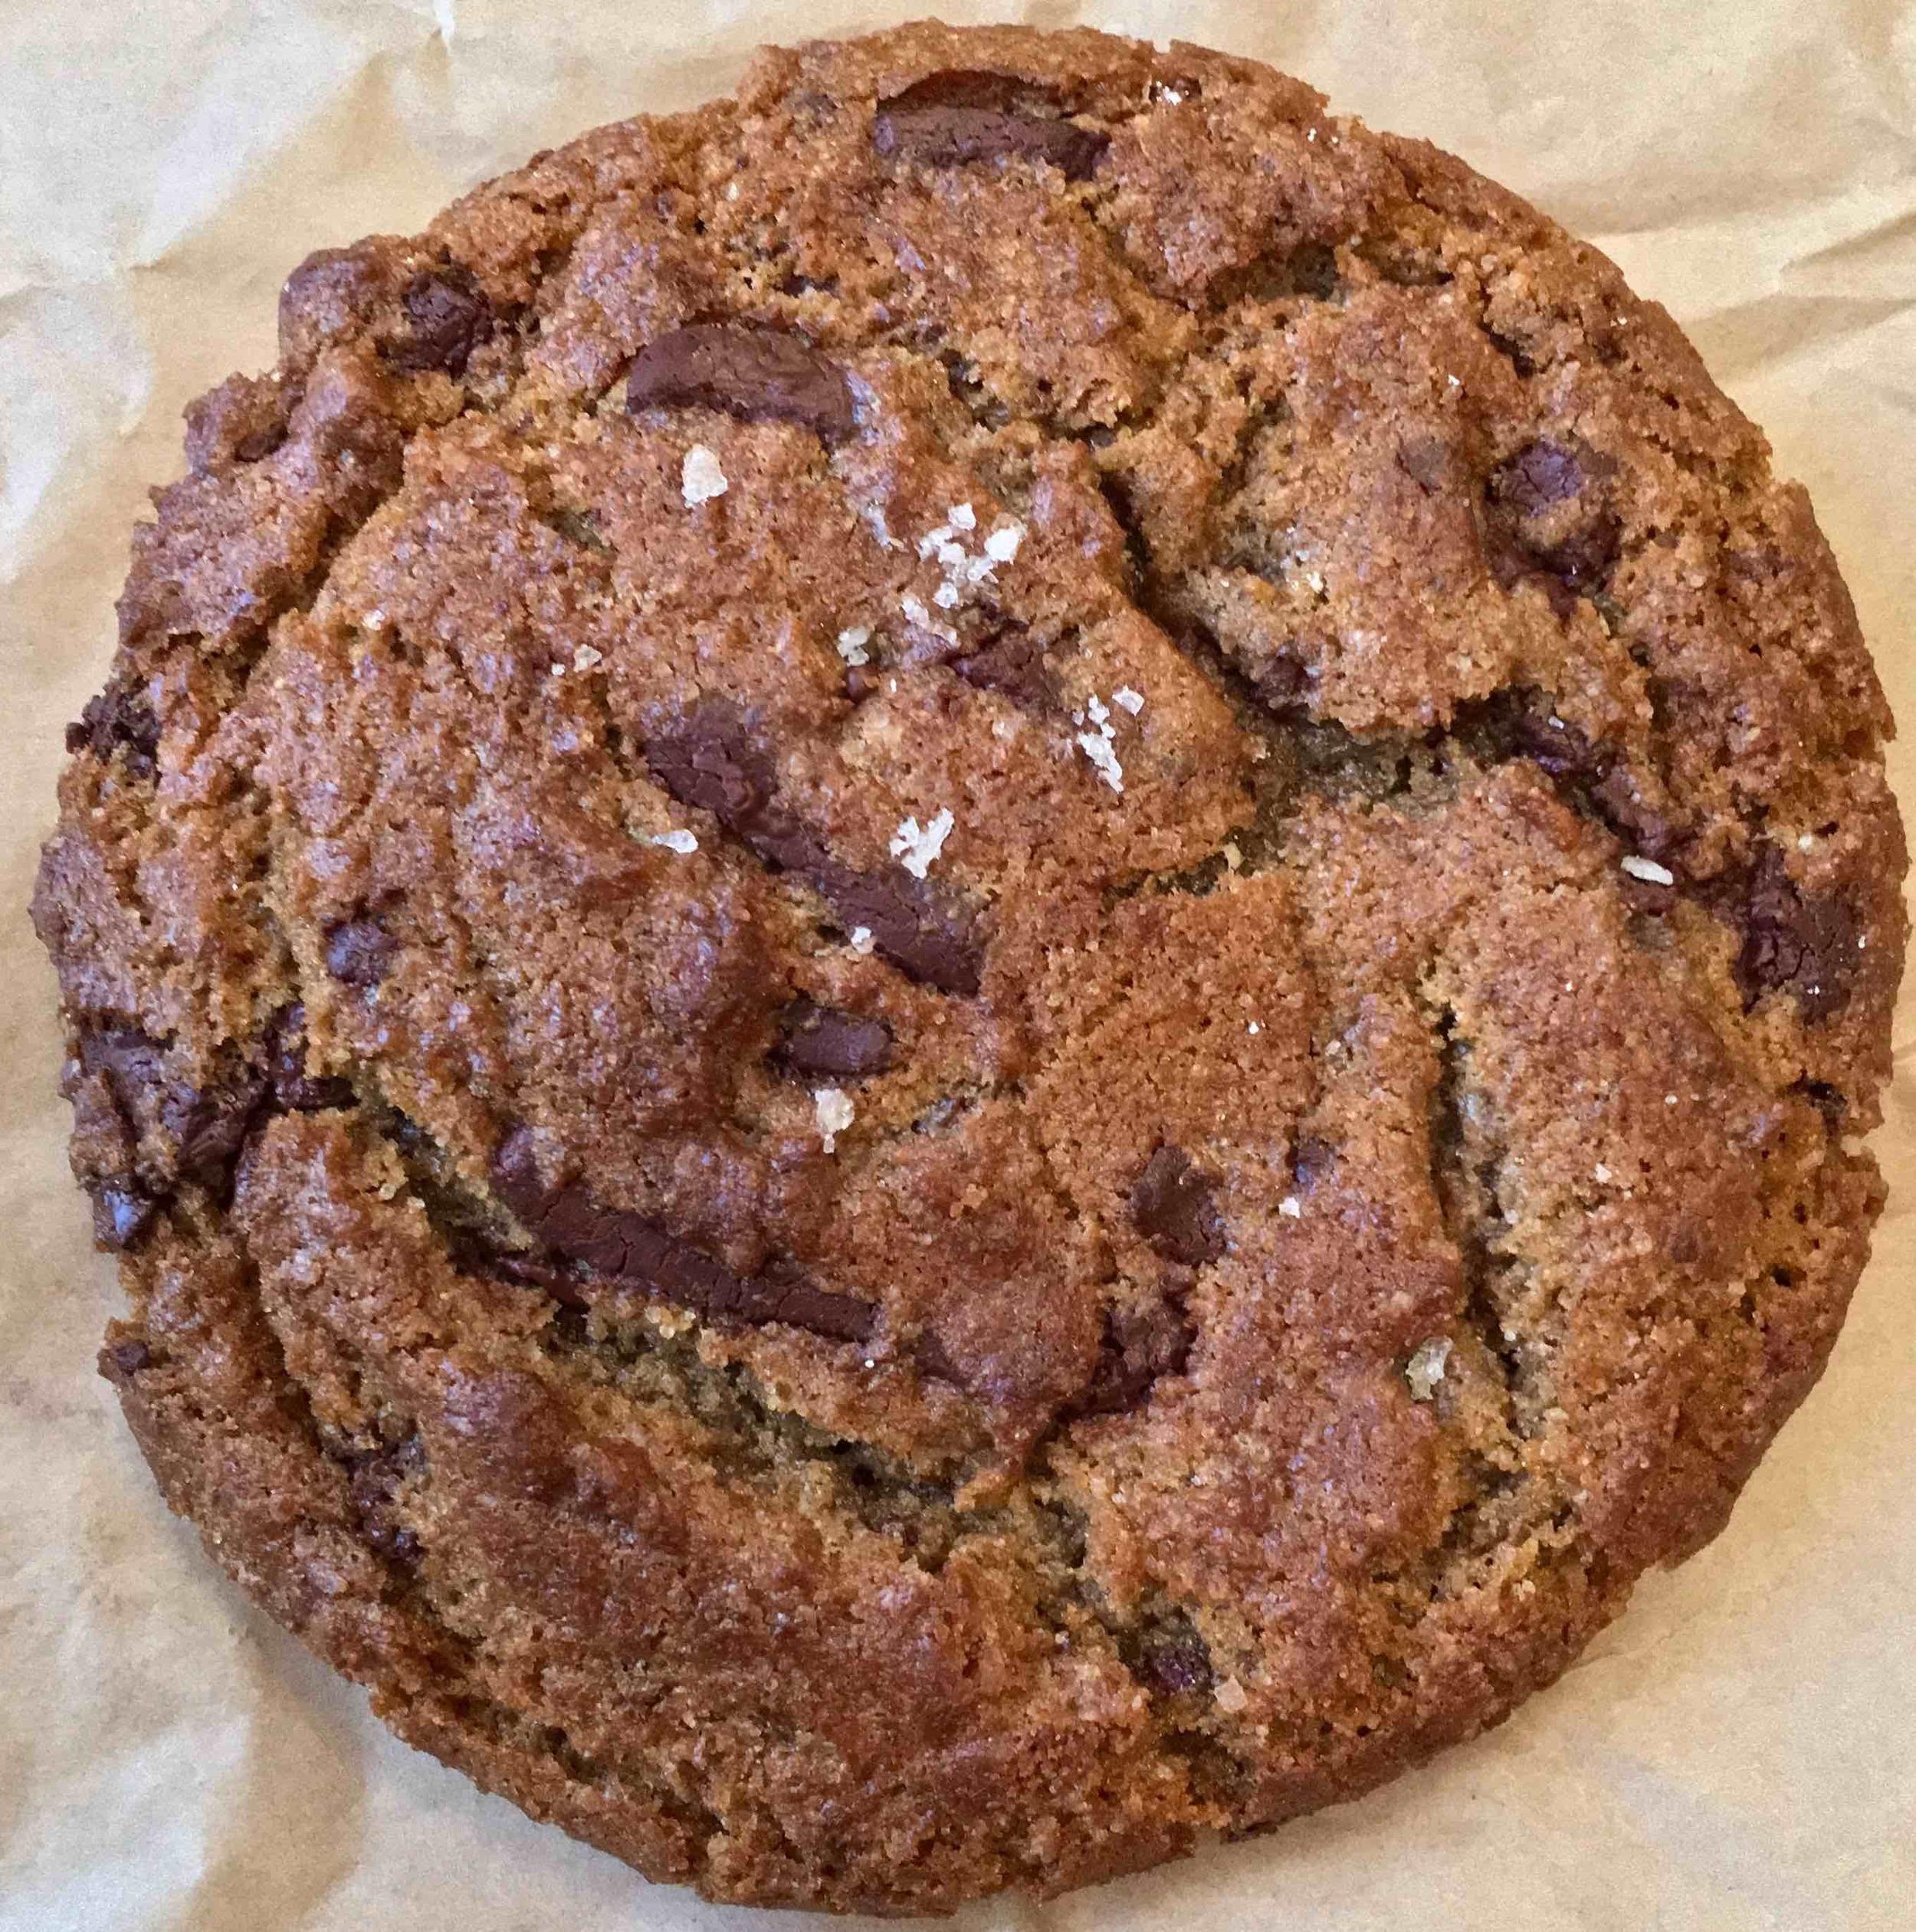 chocolate chip cookie with sea salt